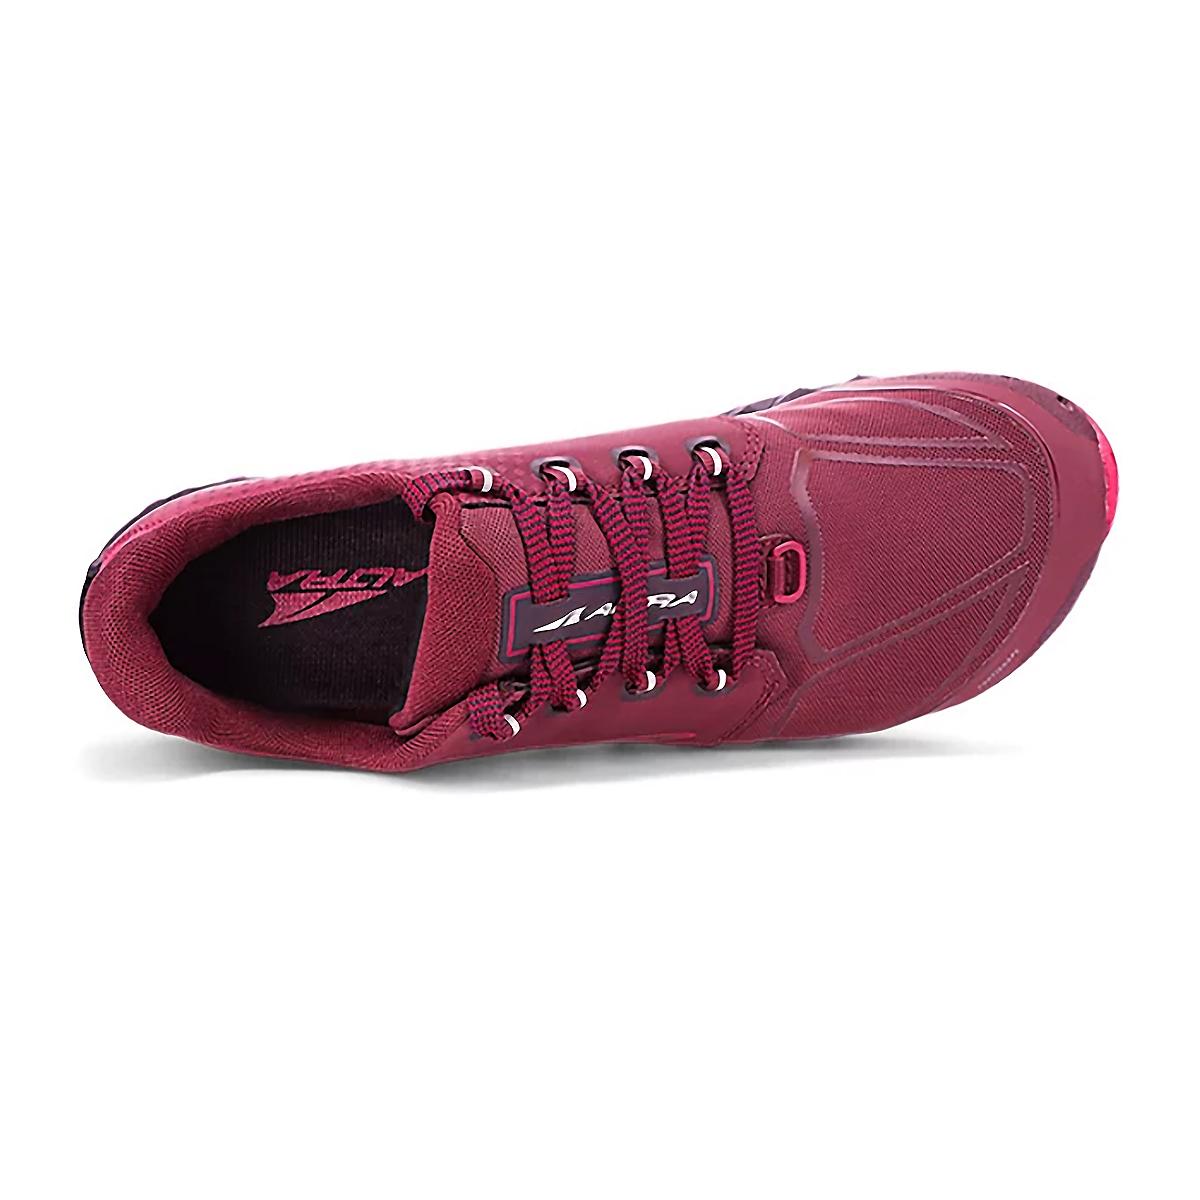 Women's Altra Superior 4.5 Trail Running Shoe - Color: Black/Pink - Size: 6 - Width: Regular, Black/Pink, large, image 3